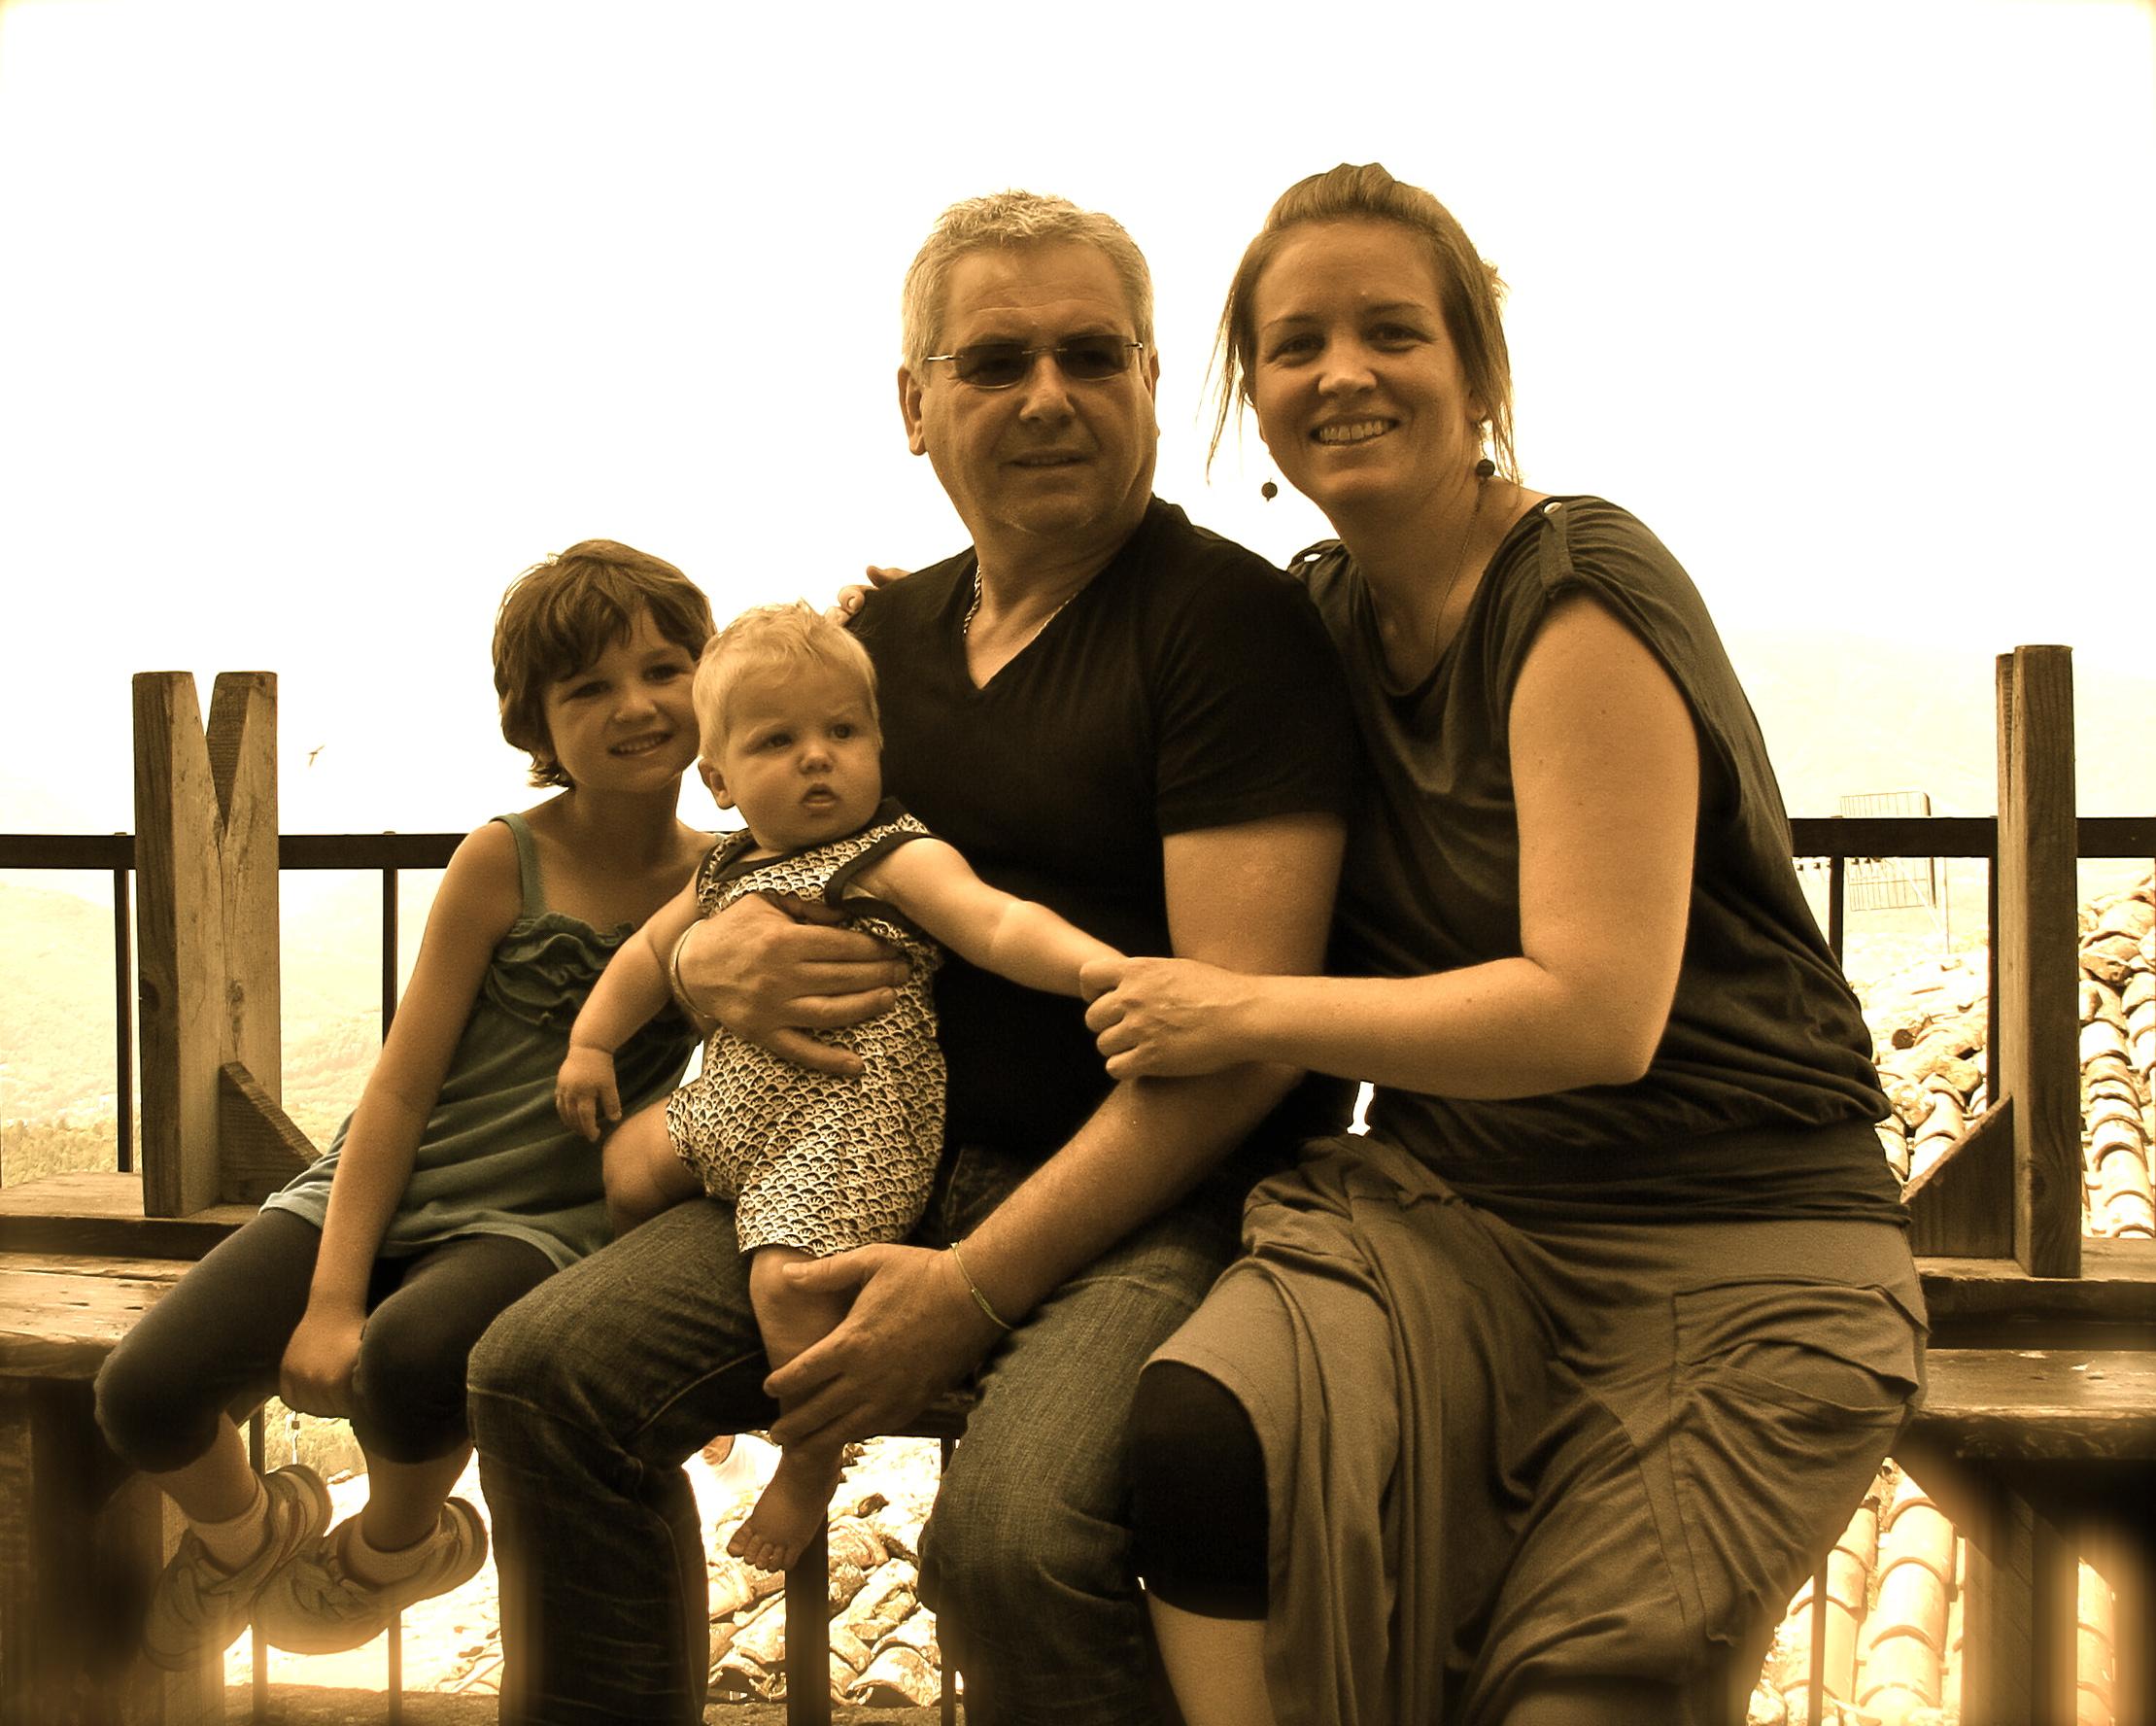 The Sorenson-Ferrara family in Sillico, Garfagnana.